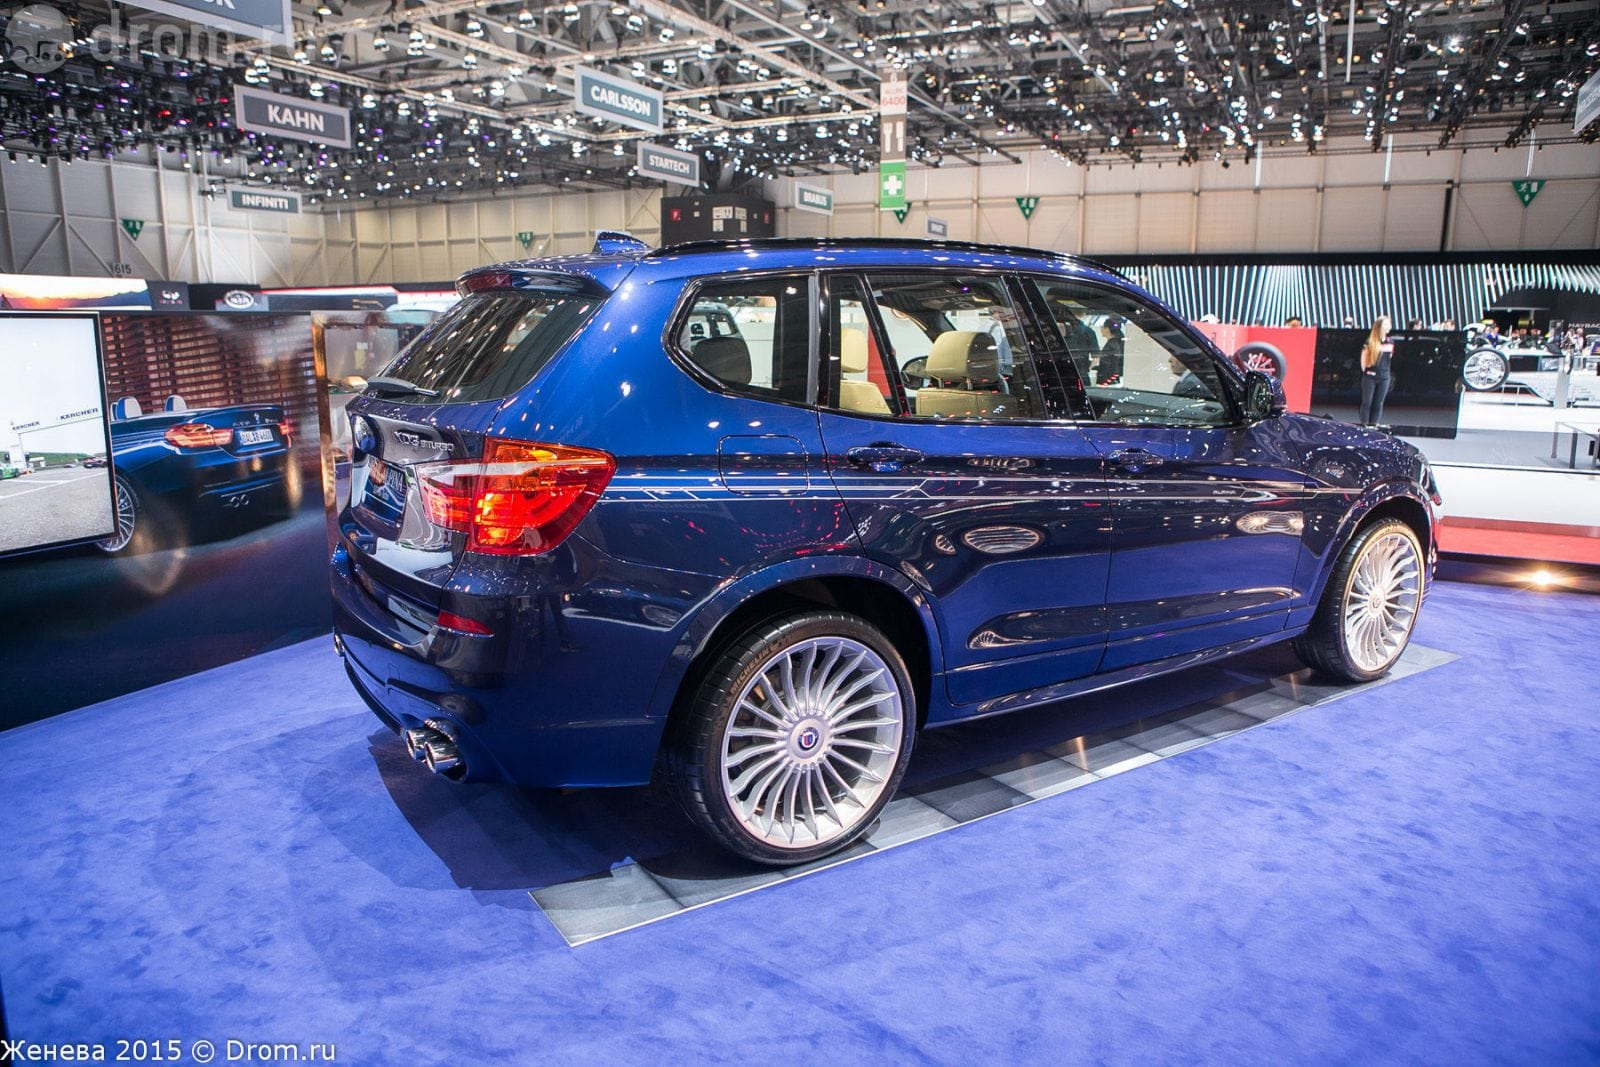 Новая BMW Alpina XD3 Bi turbo на автосалоне в Женеве, 2015 год